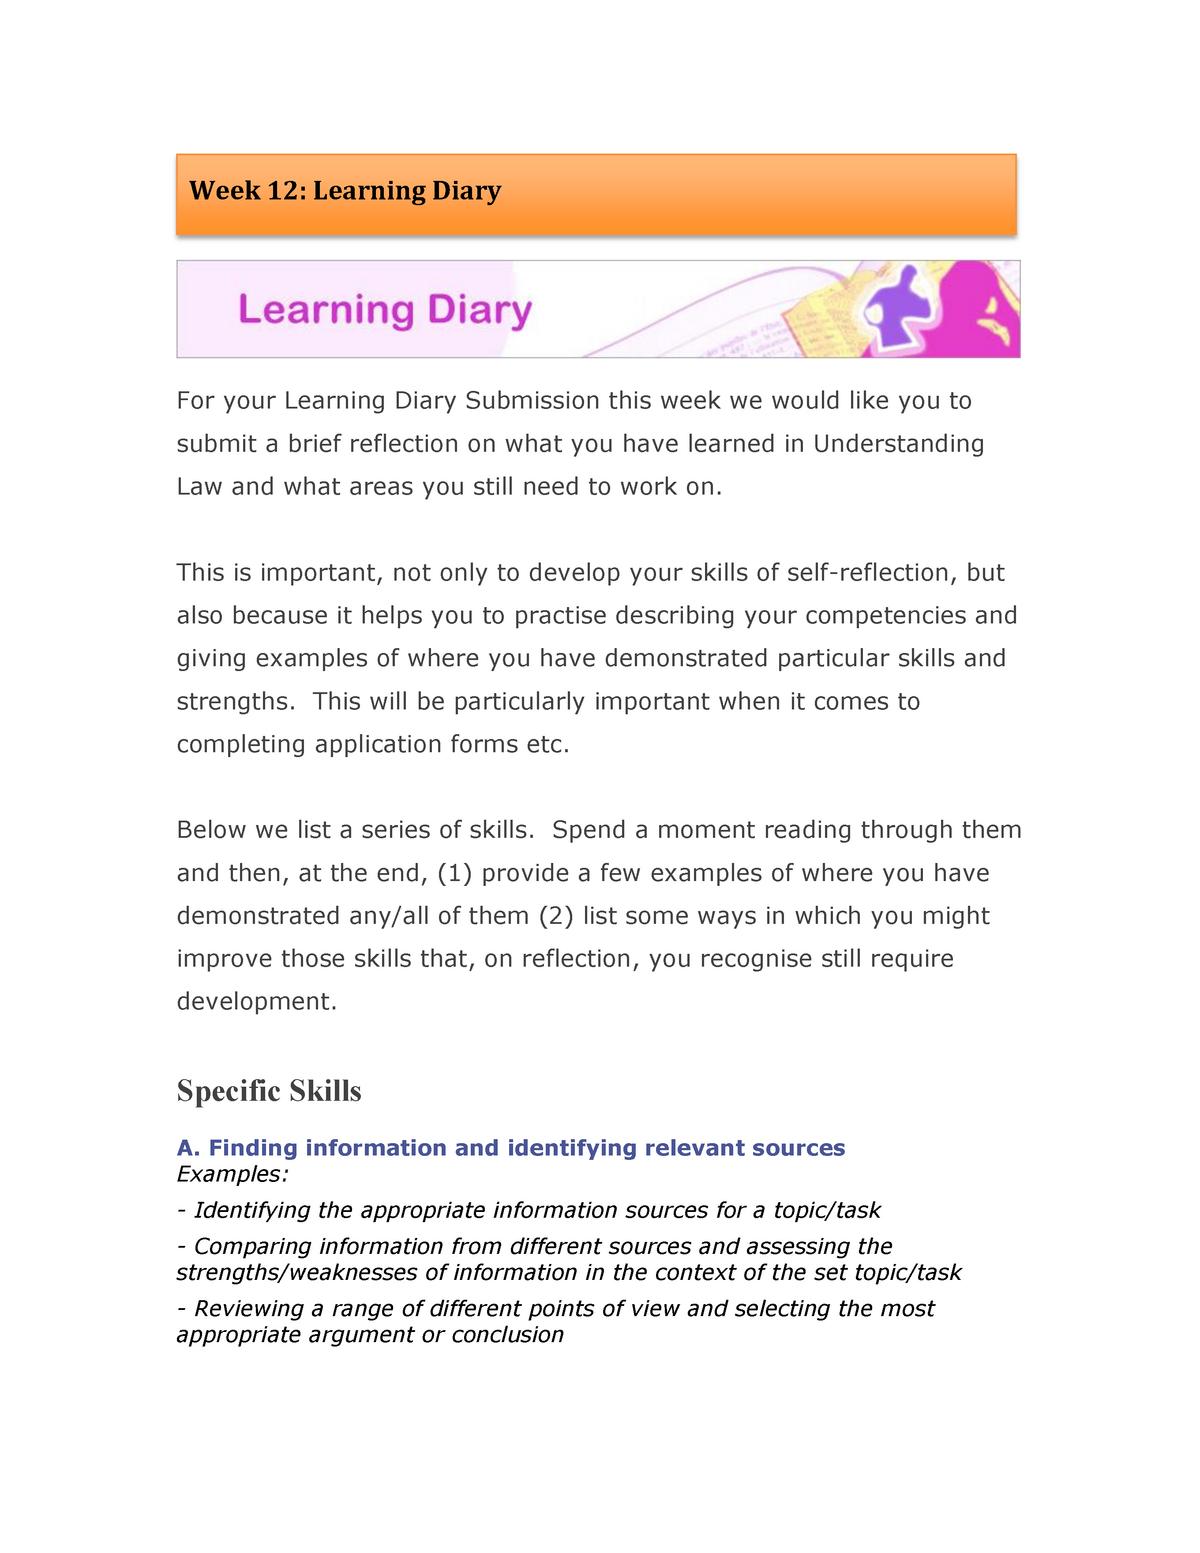 Week 12 Learning Diary - 15013319: FB V: FFA anglo